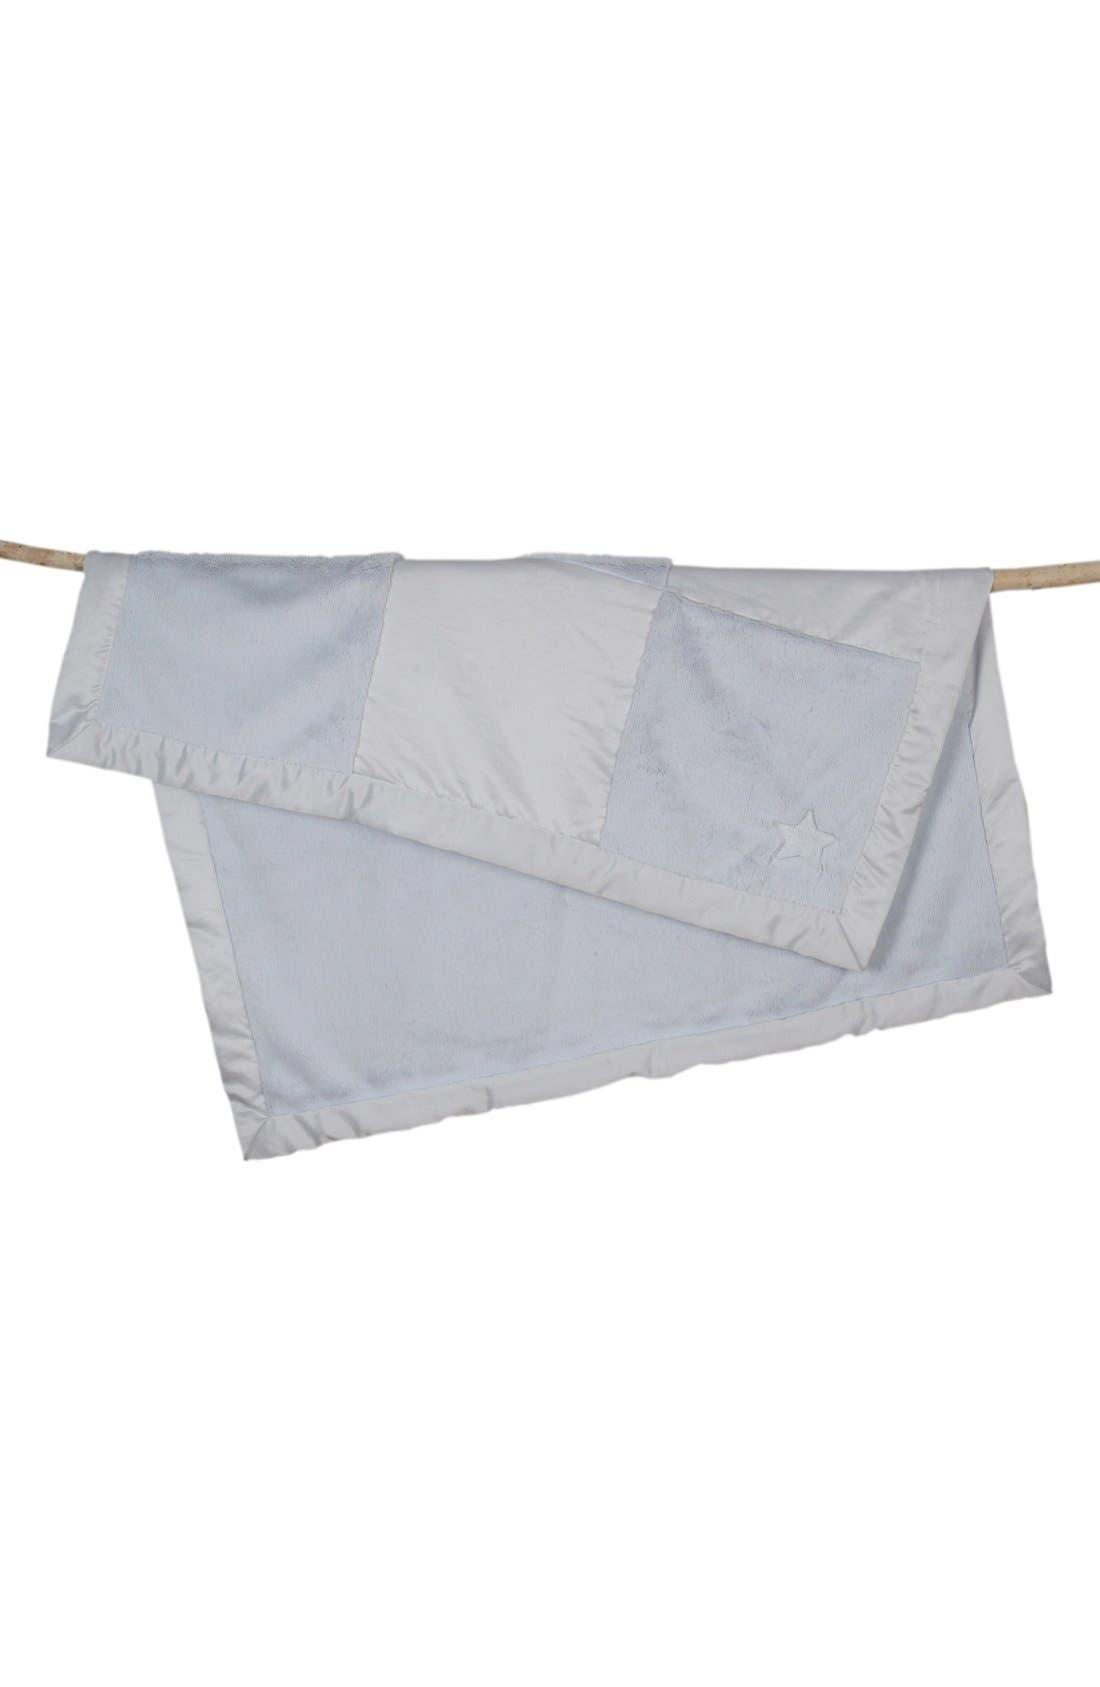 'Cuddle' Patchwork Receiving Blanket,                         Main,                         color, 400